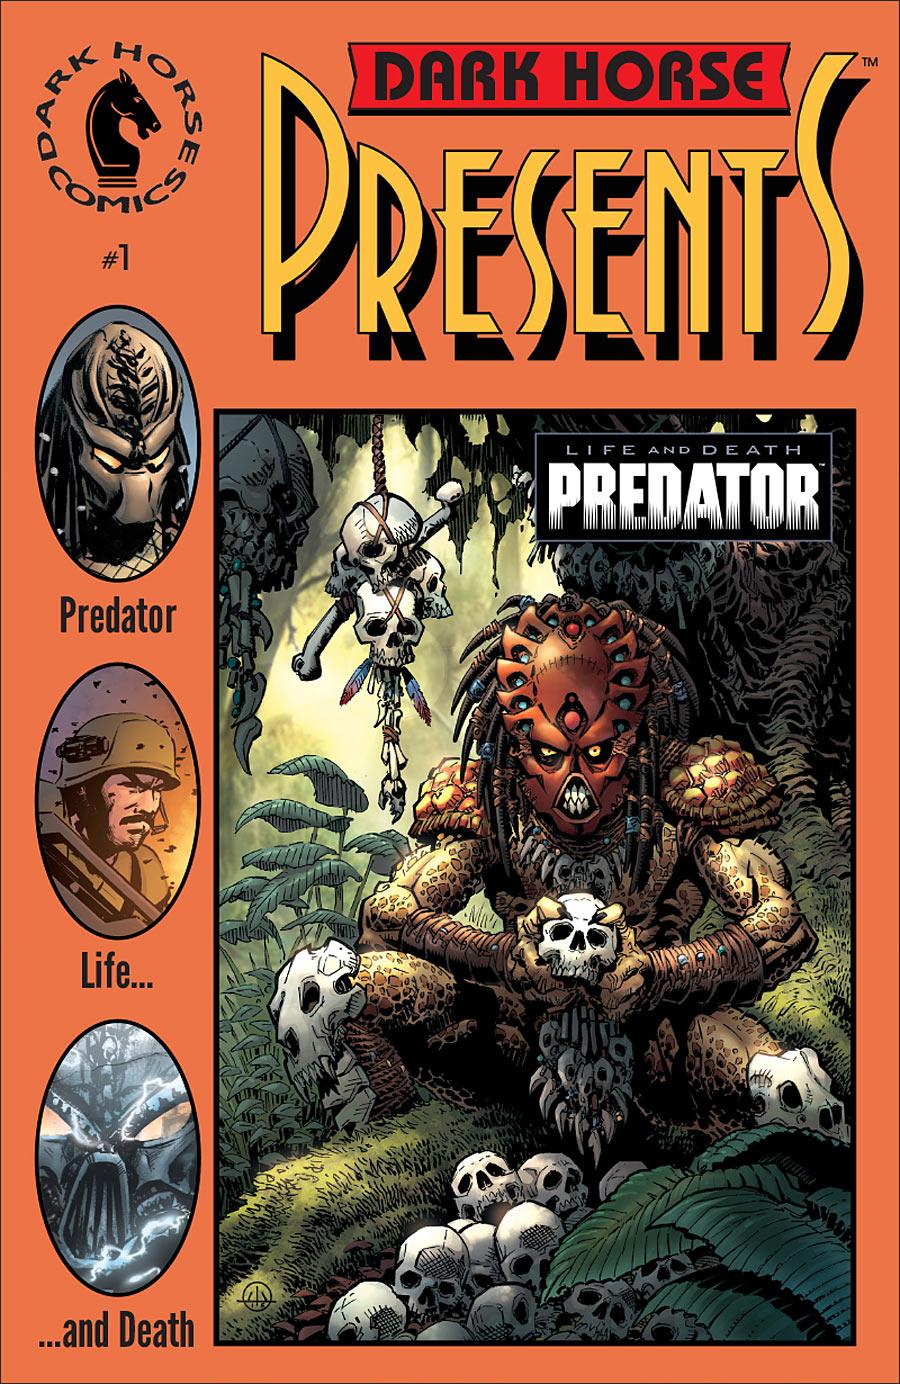 Predator Life and Death portada alternativa 30 aniversario